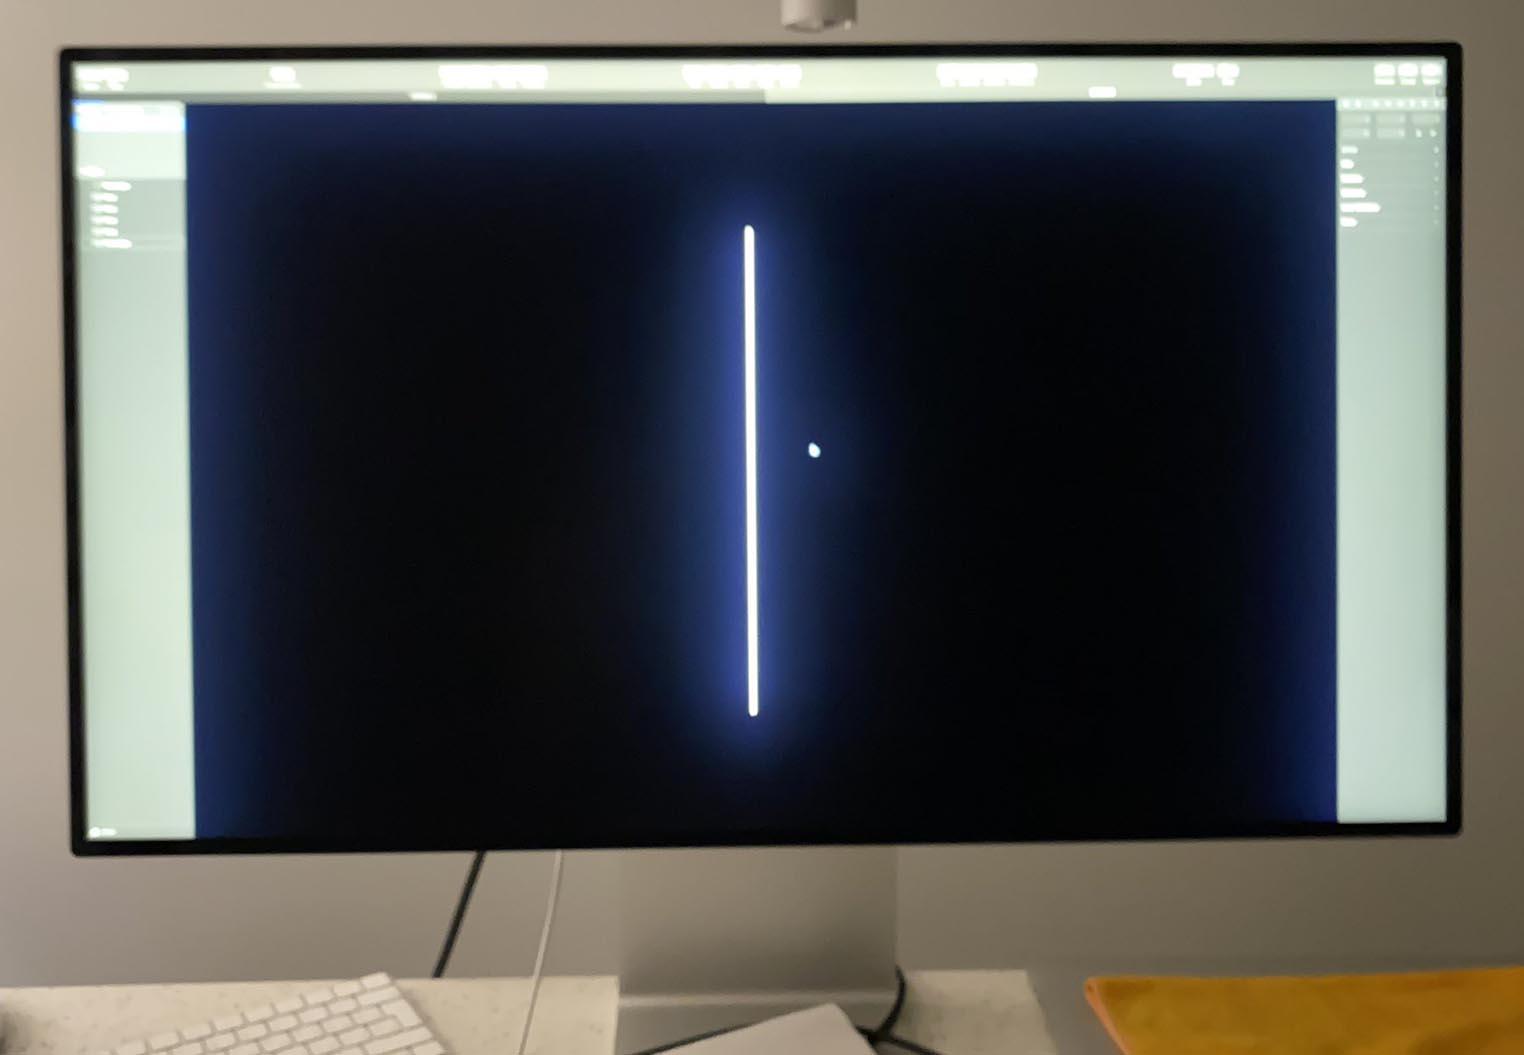 Pro Display XDR Mini LED local dimming